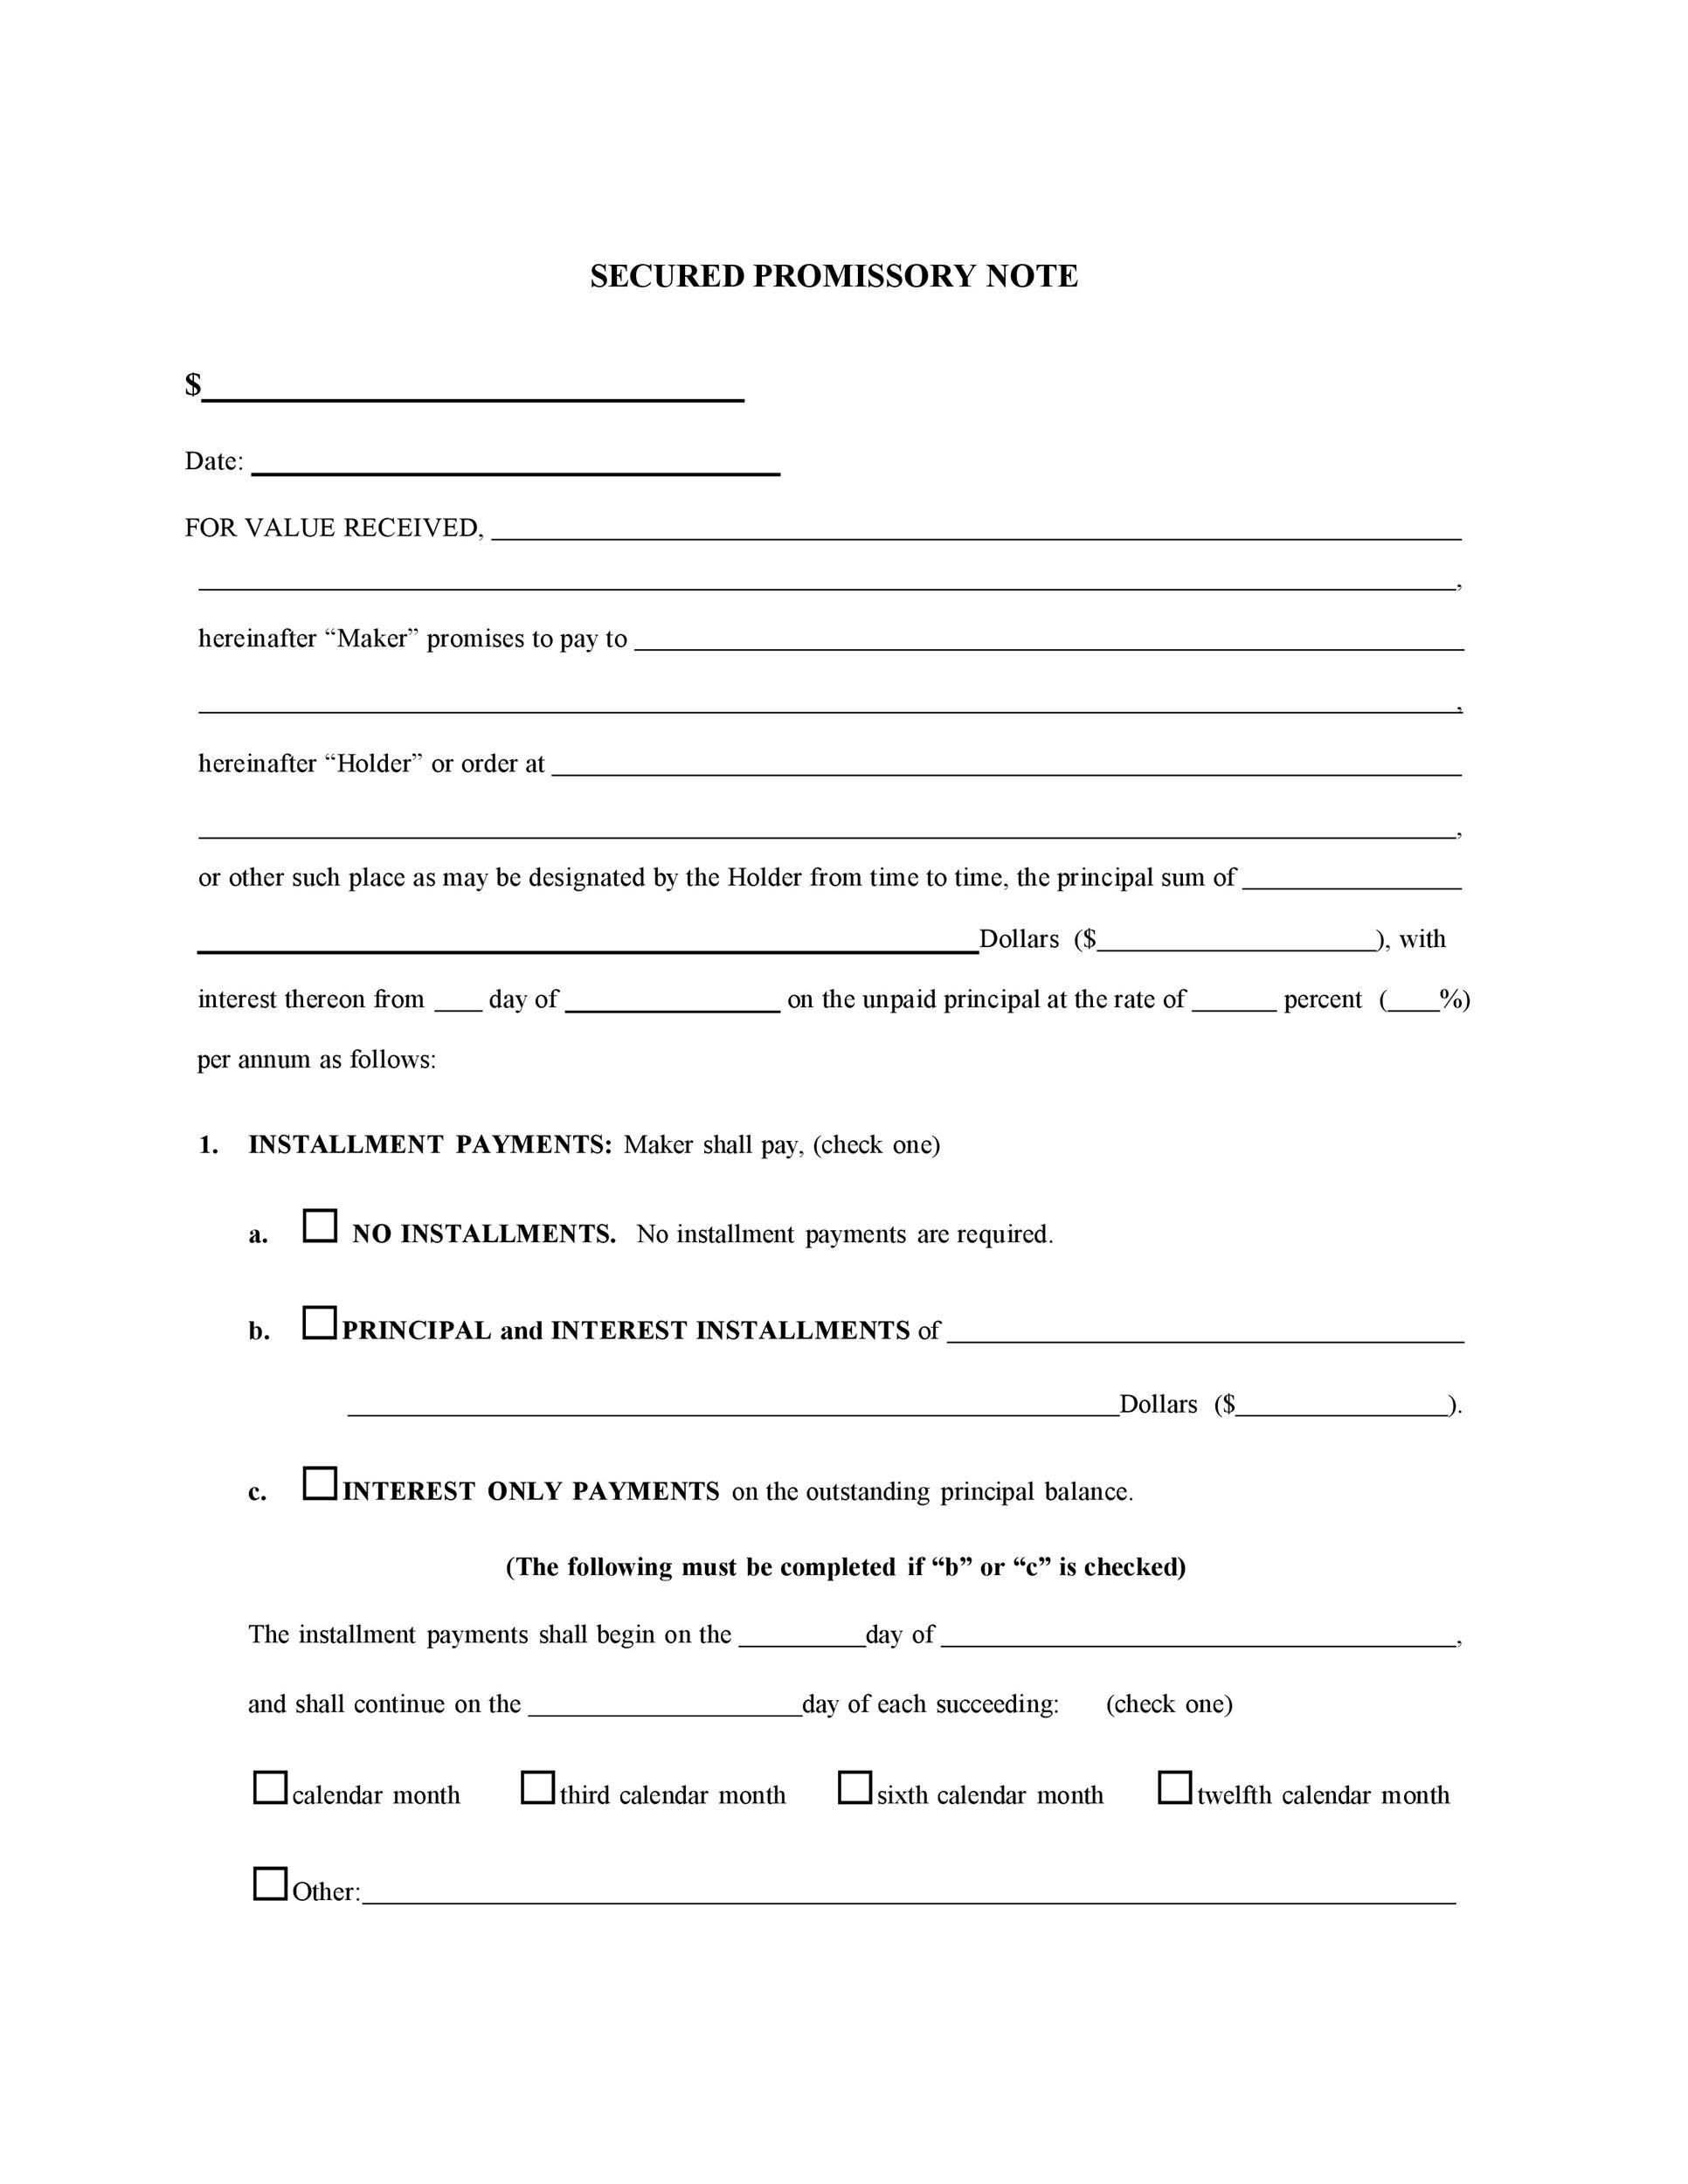 008 Fascinating Promissory Note Template Free Photo  Pdf Florida Blank FormFull